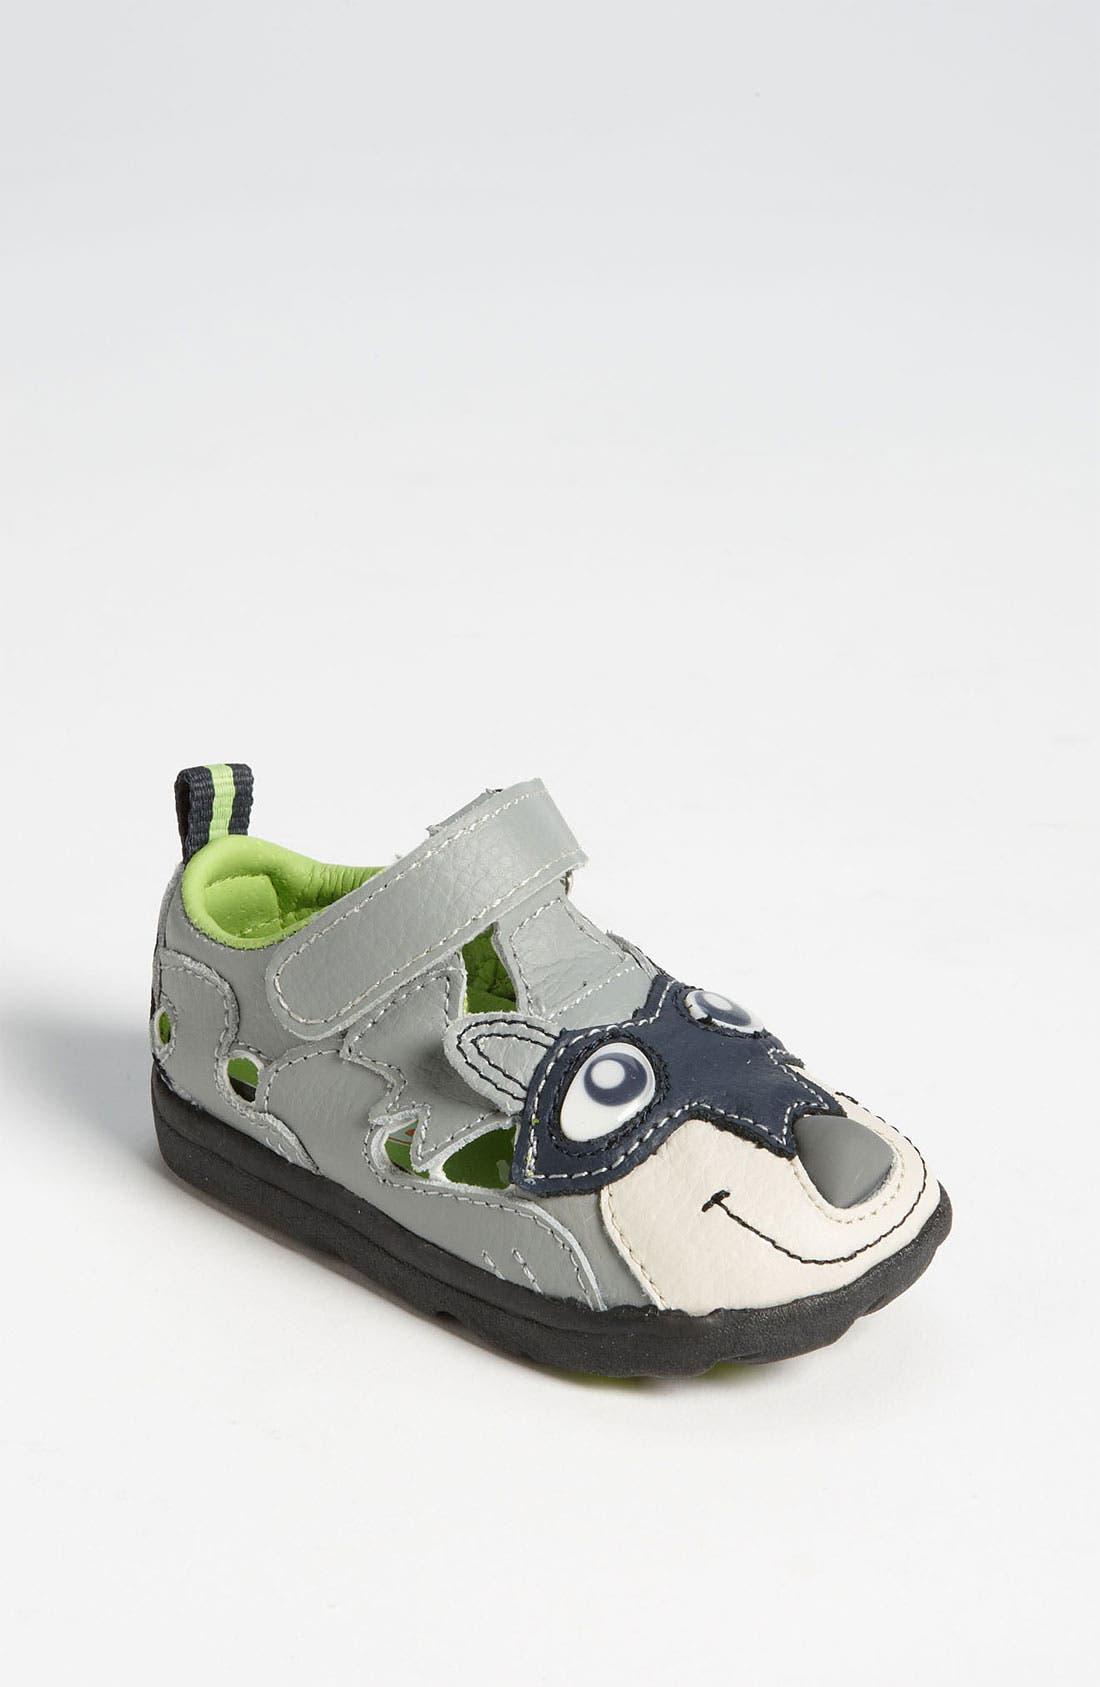 Alternate Image 1 Selected - Zooligans™ 'Raccoon' Sport Sandal (Baby, Walker & Toddler)